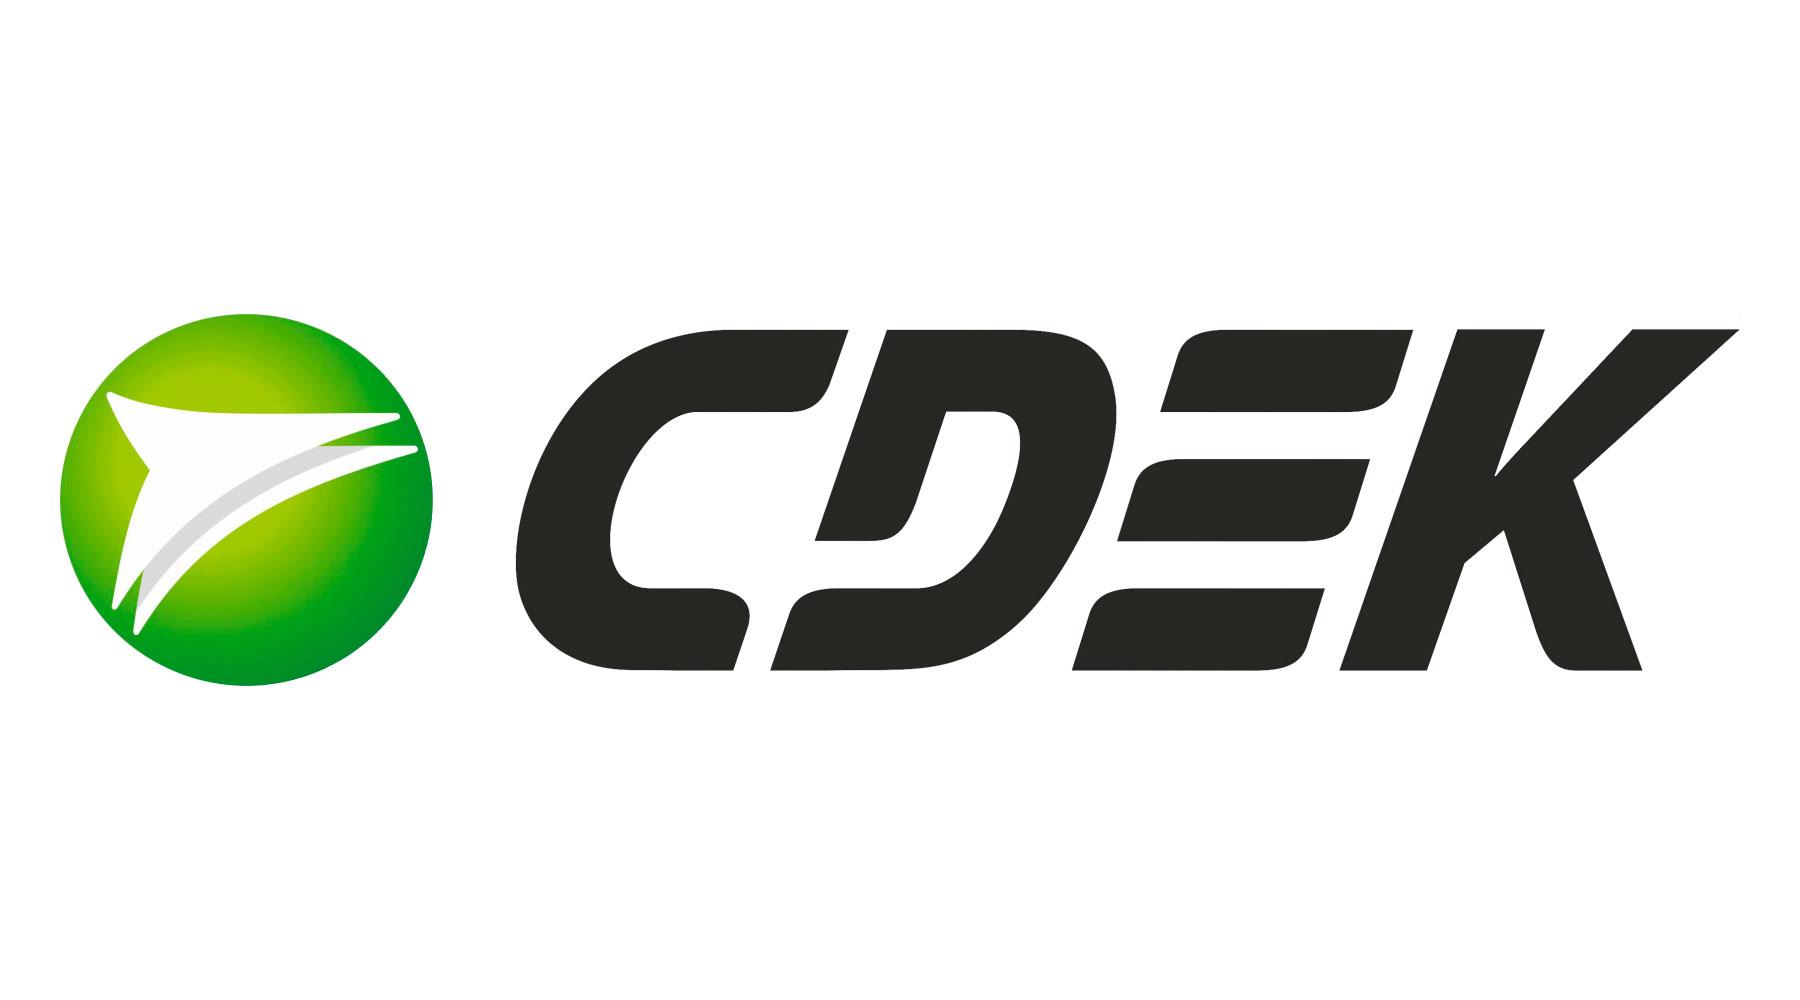 Cdek logo